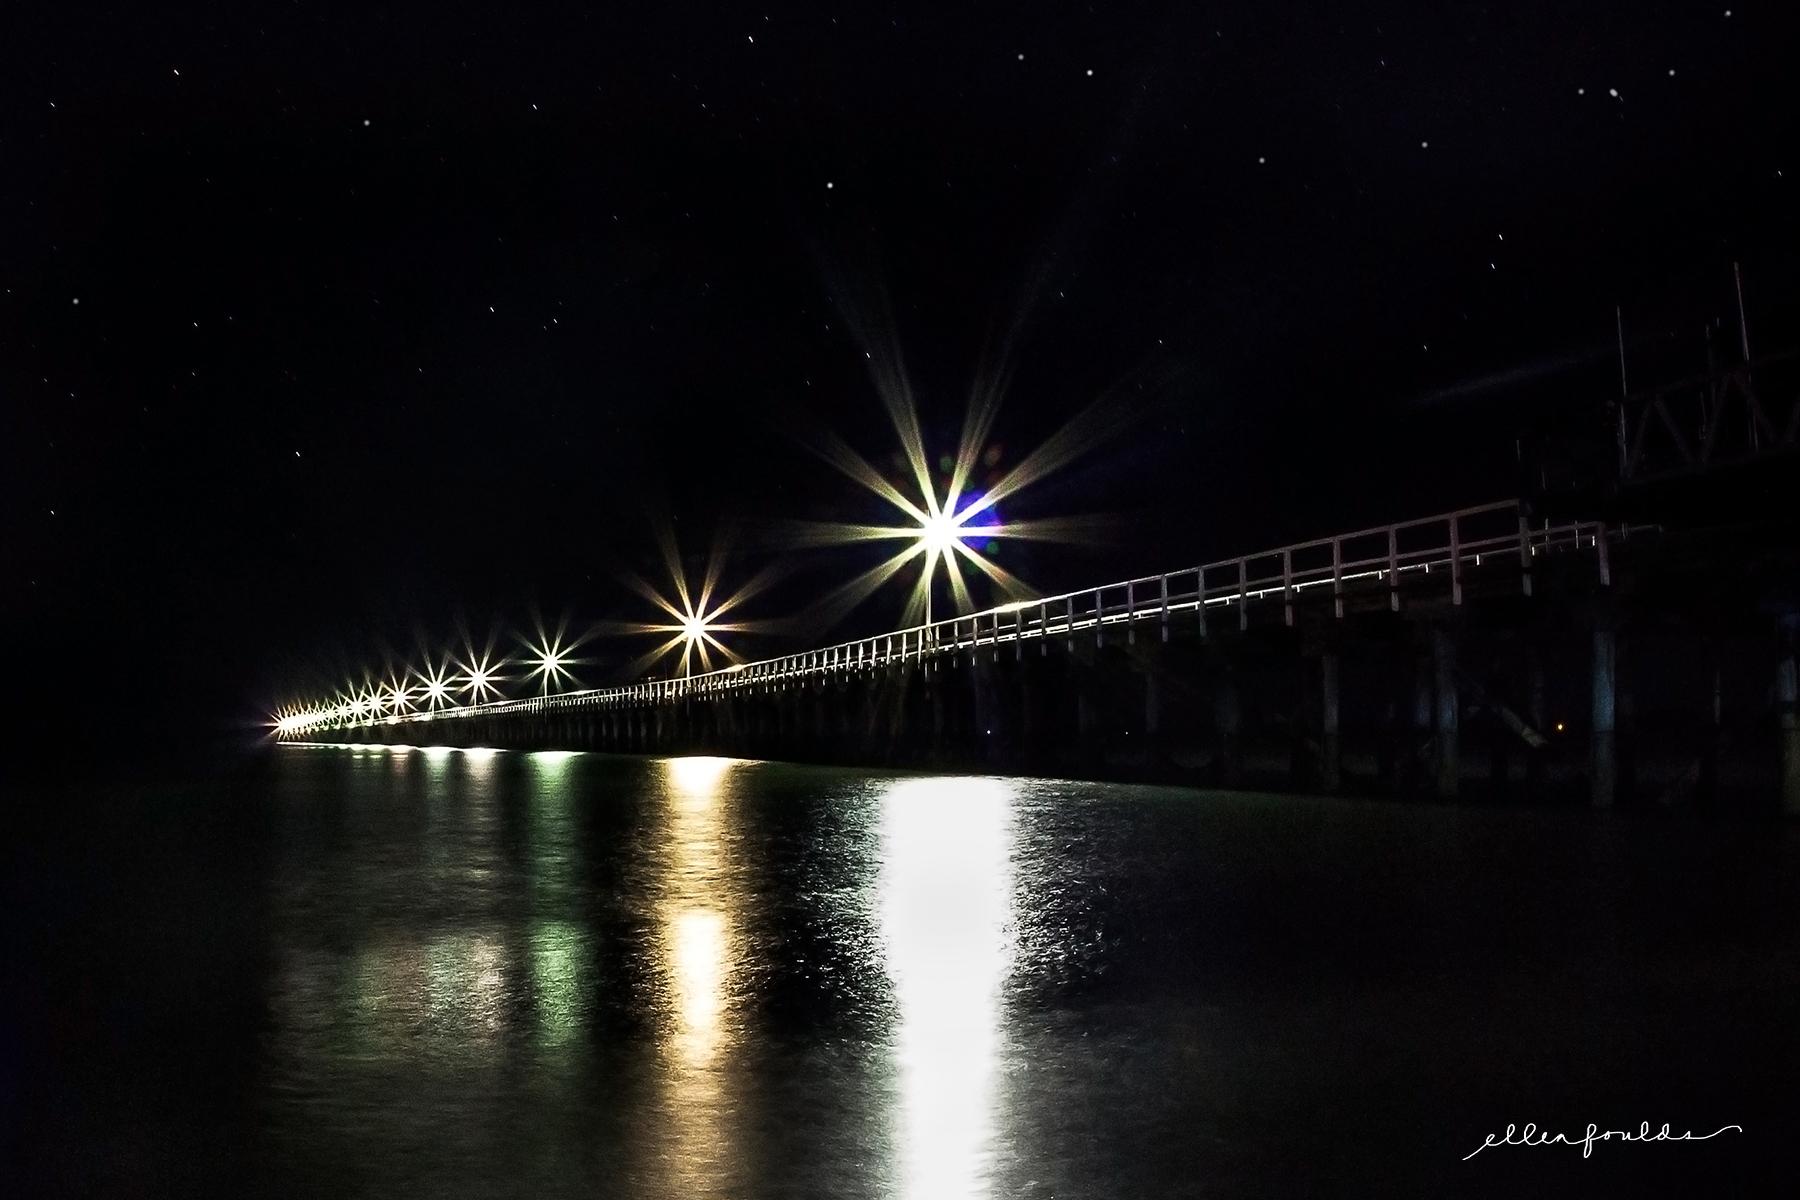 Evening Sparkles